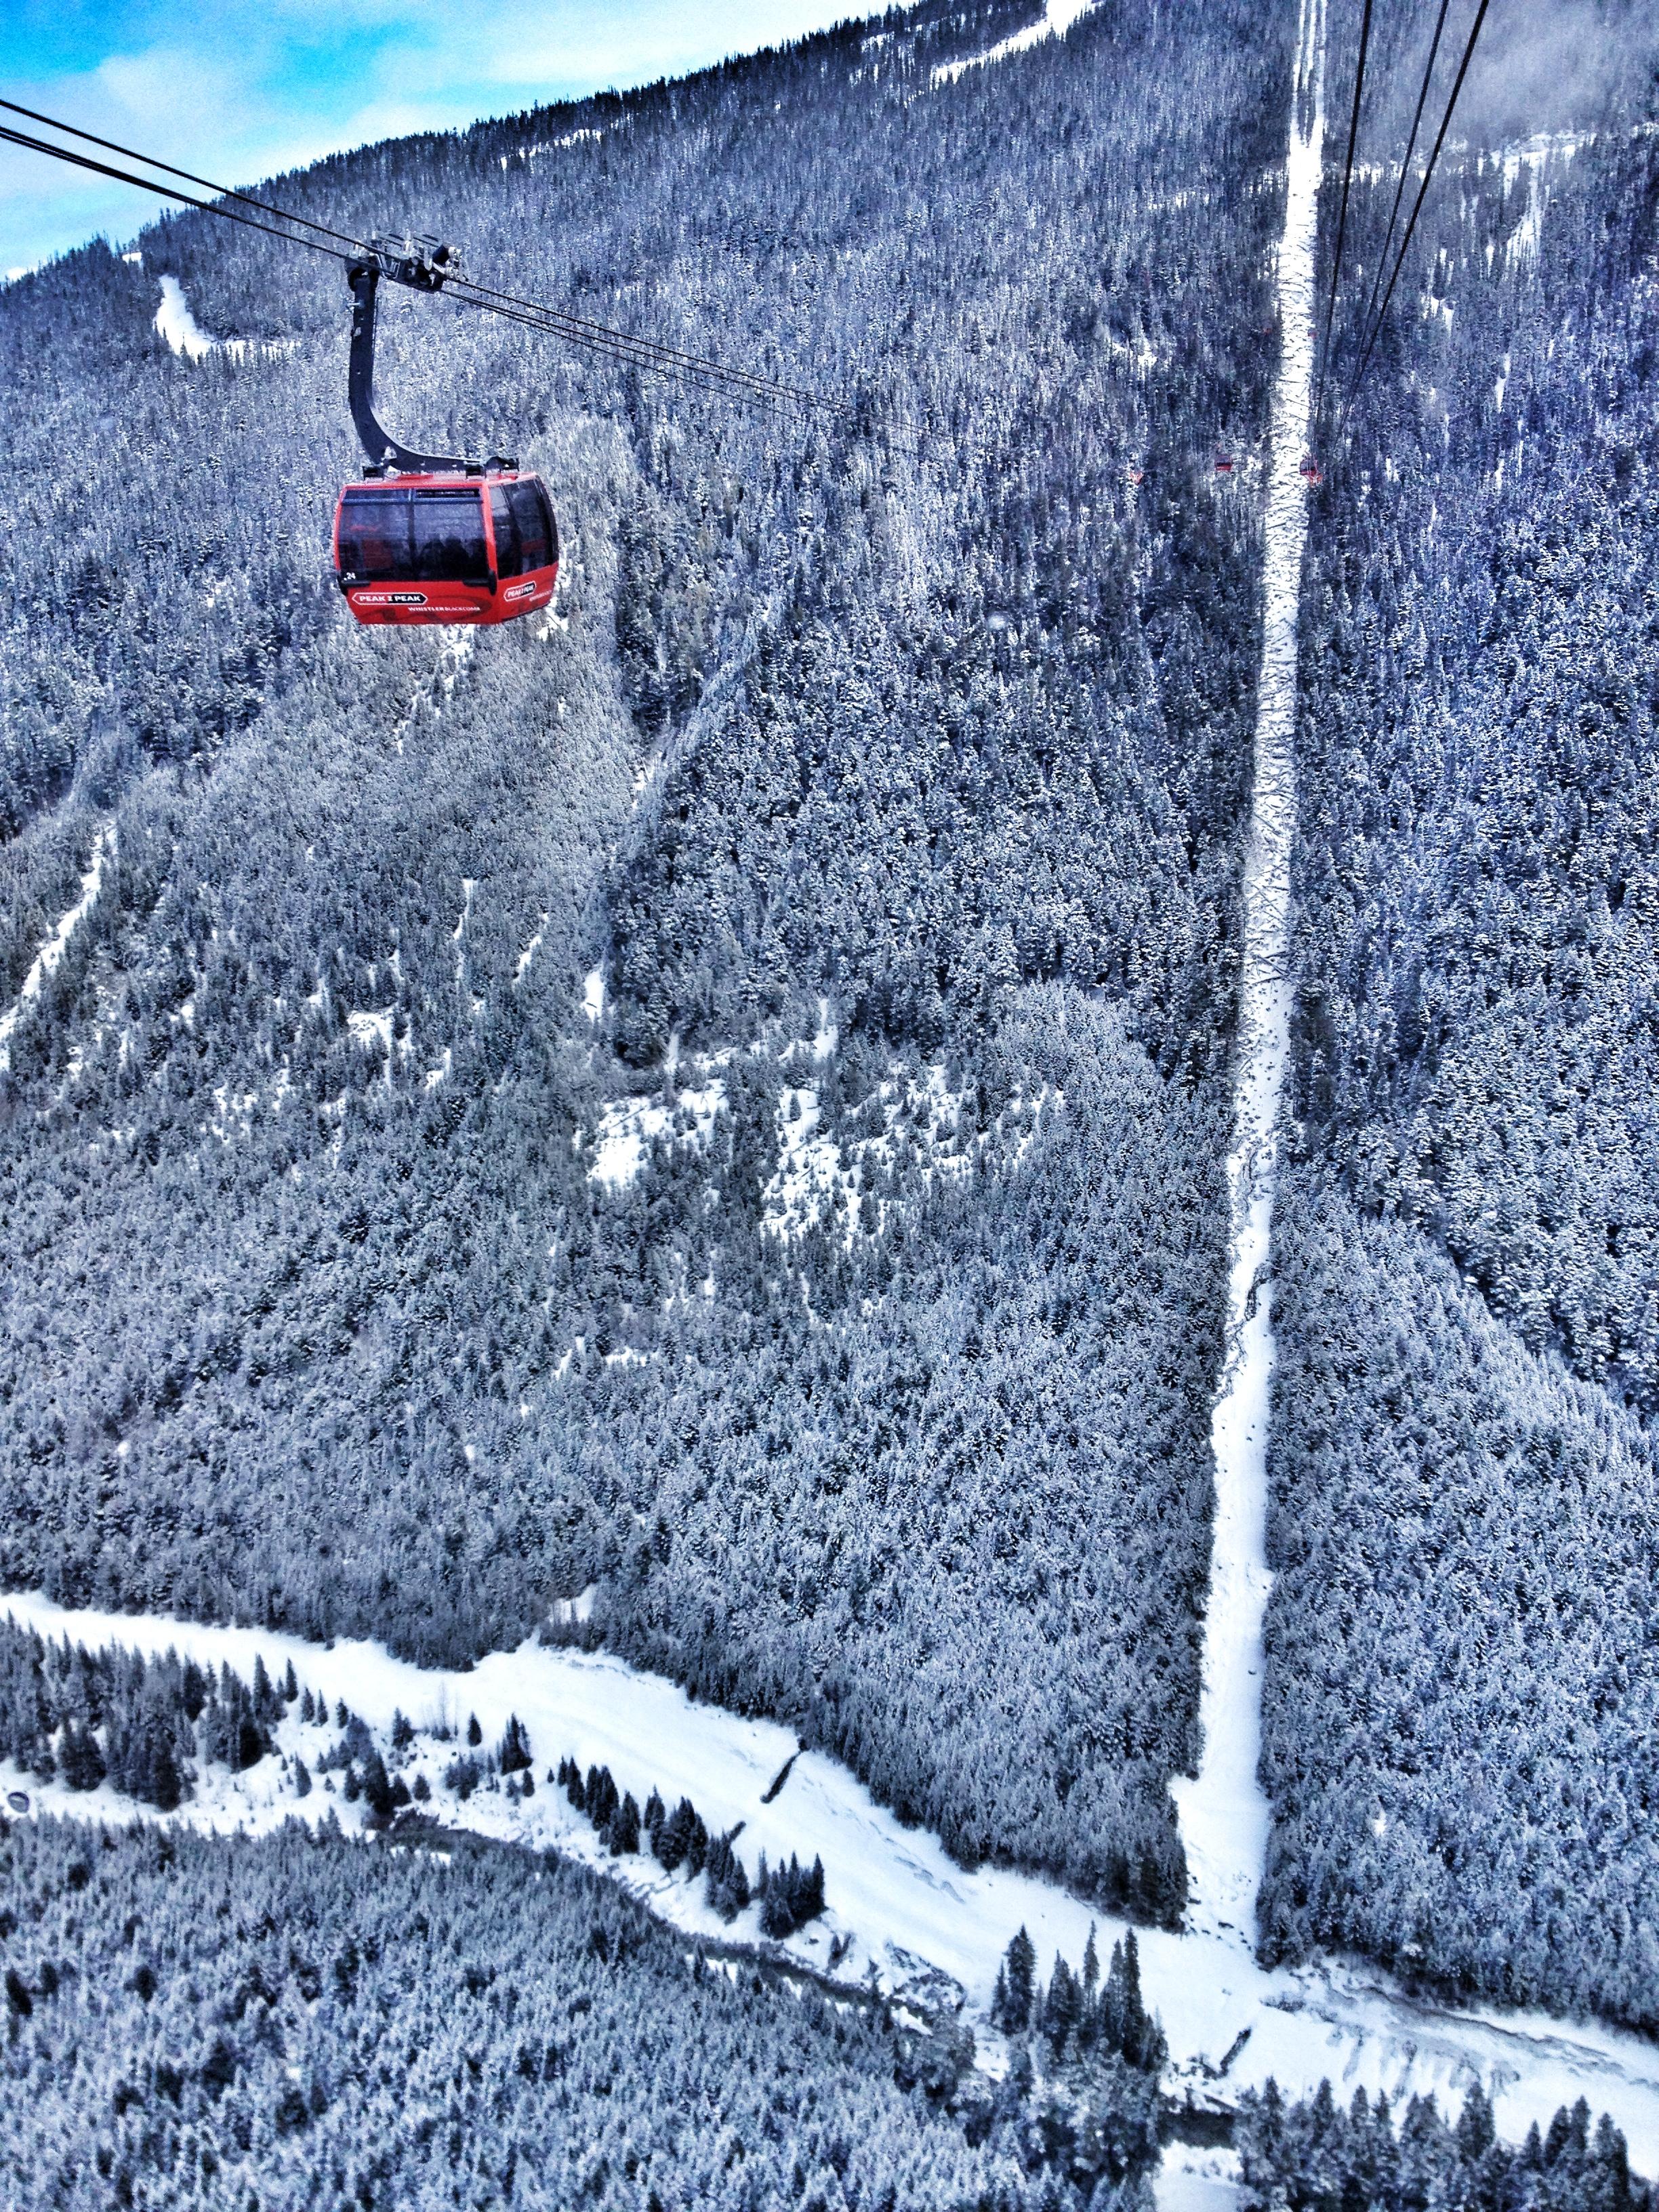 Taking a fun ride on the Peak 2 Peak Gondola